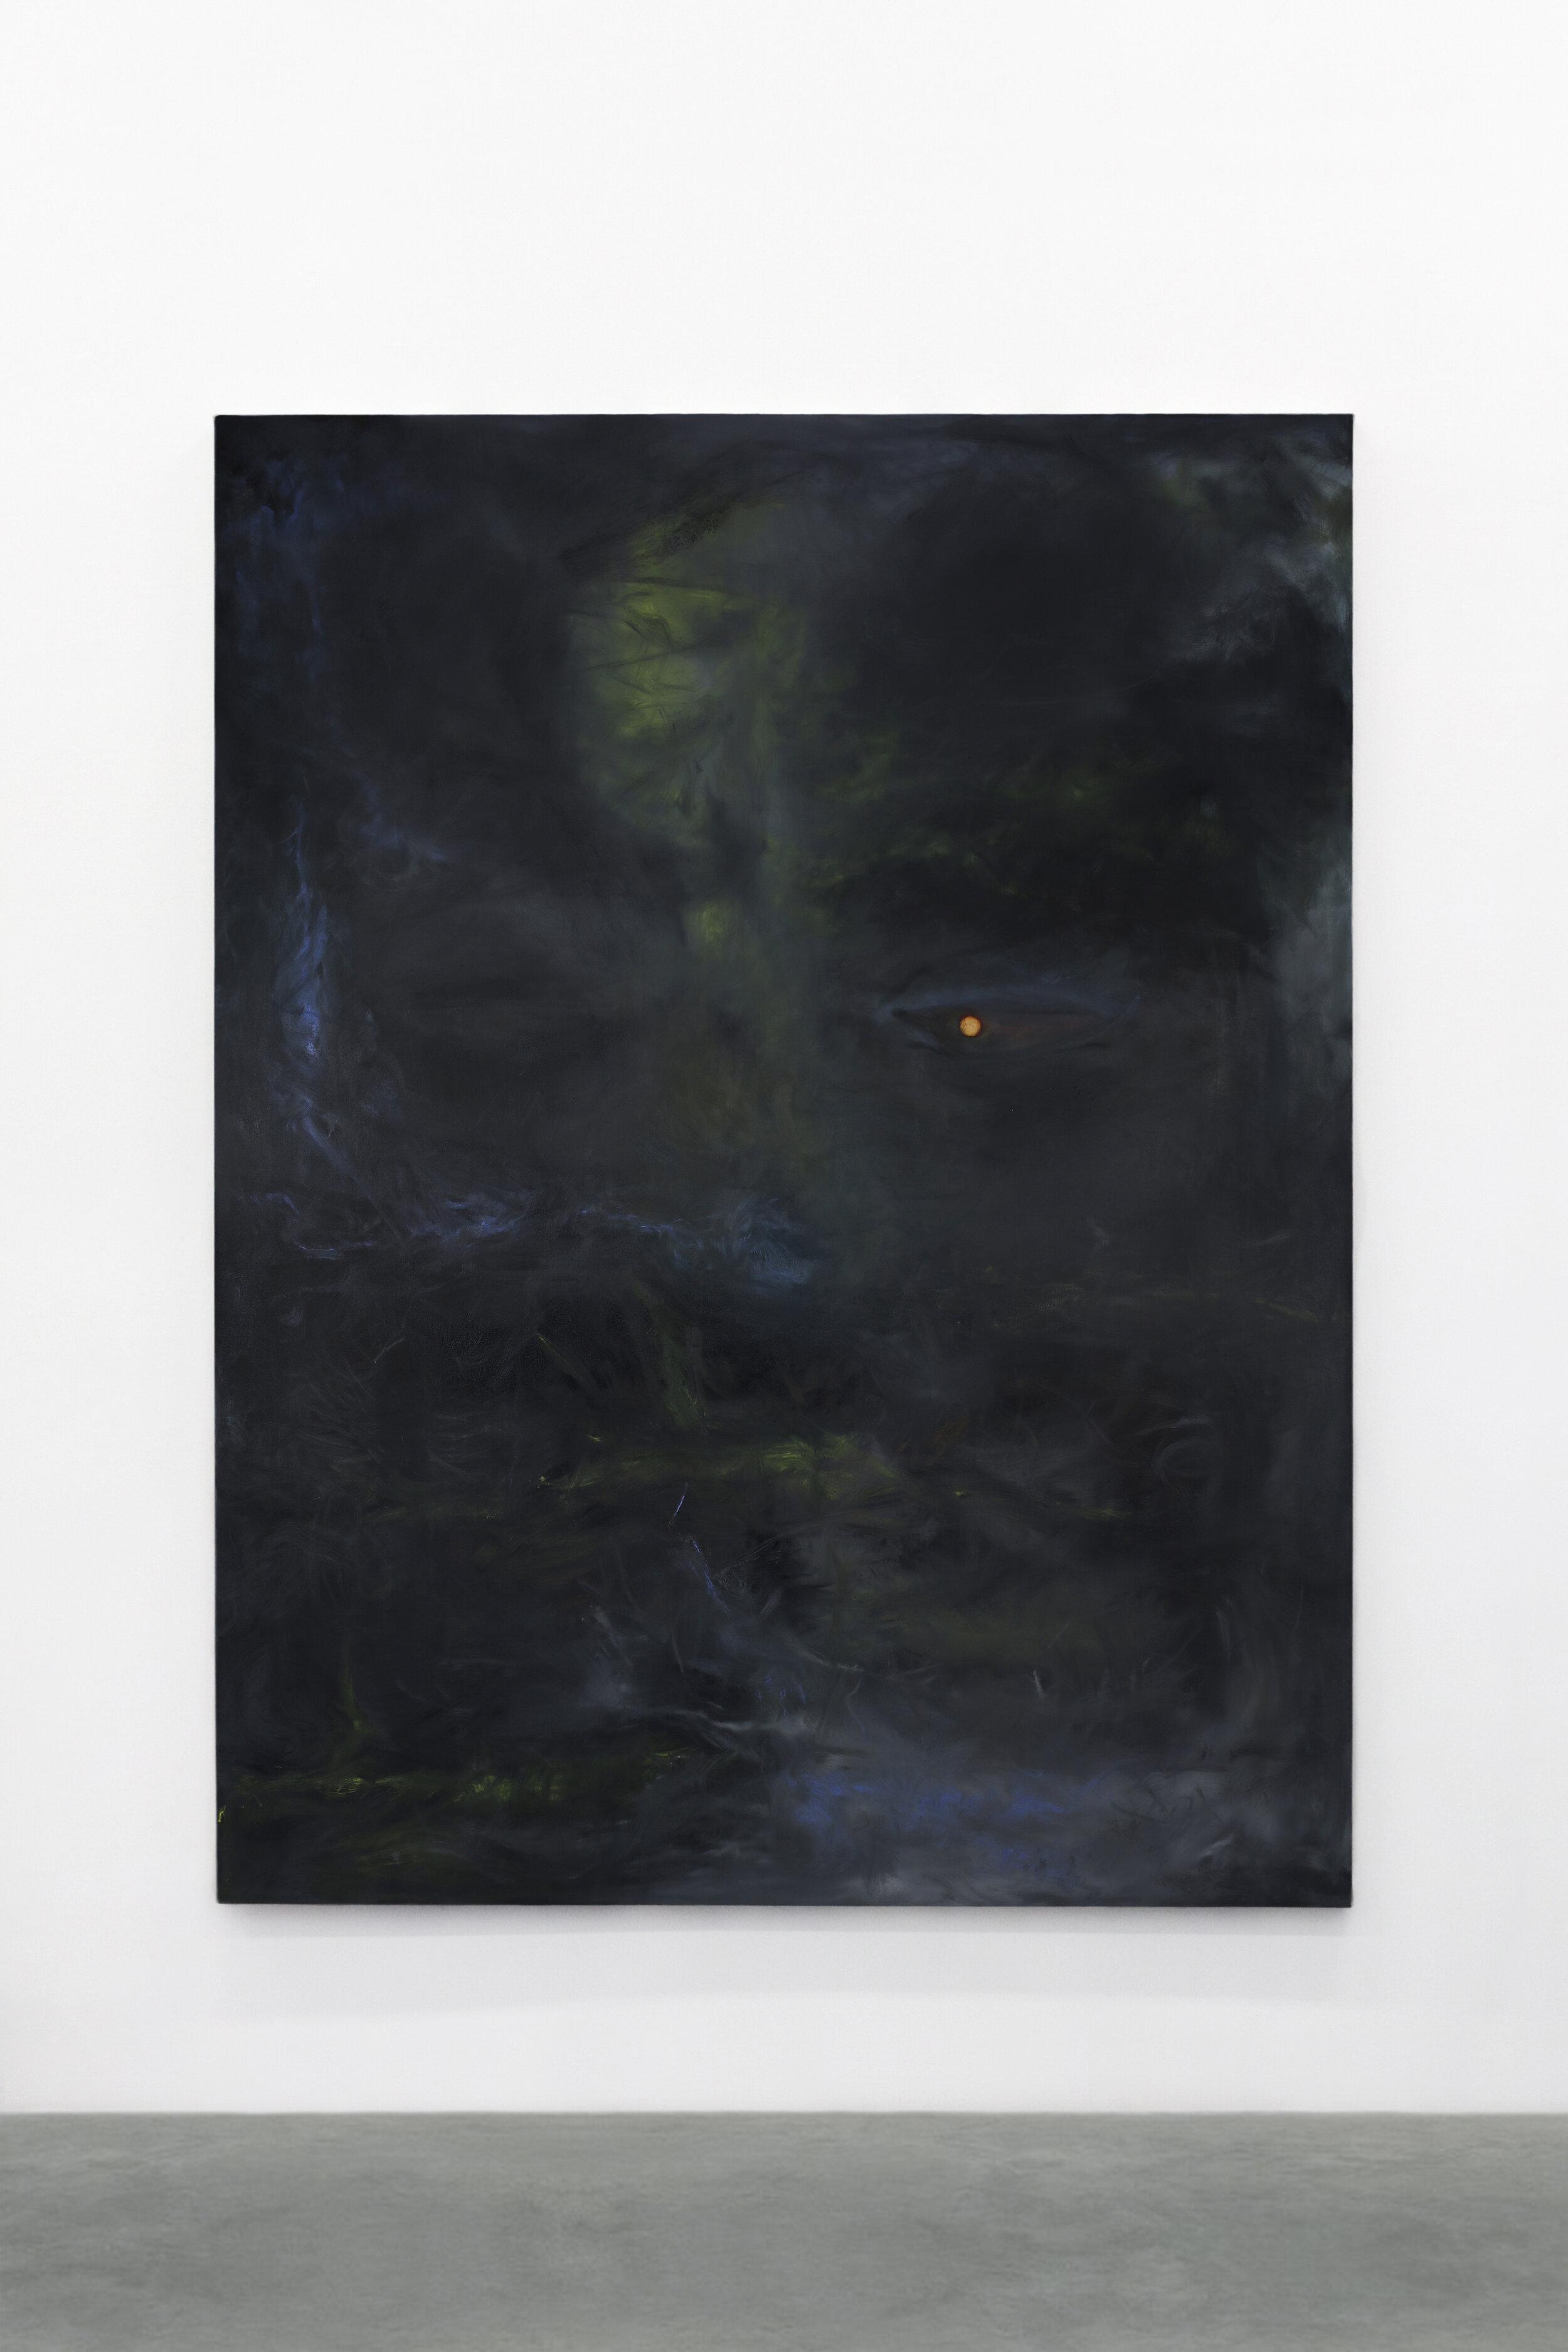 S. Derviz, Unititled, oil on canvas, 200x160cm, 2018 (8.1).jpg